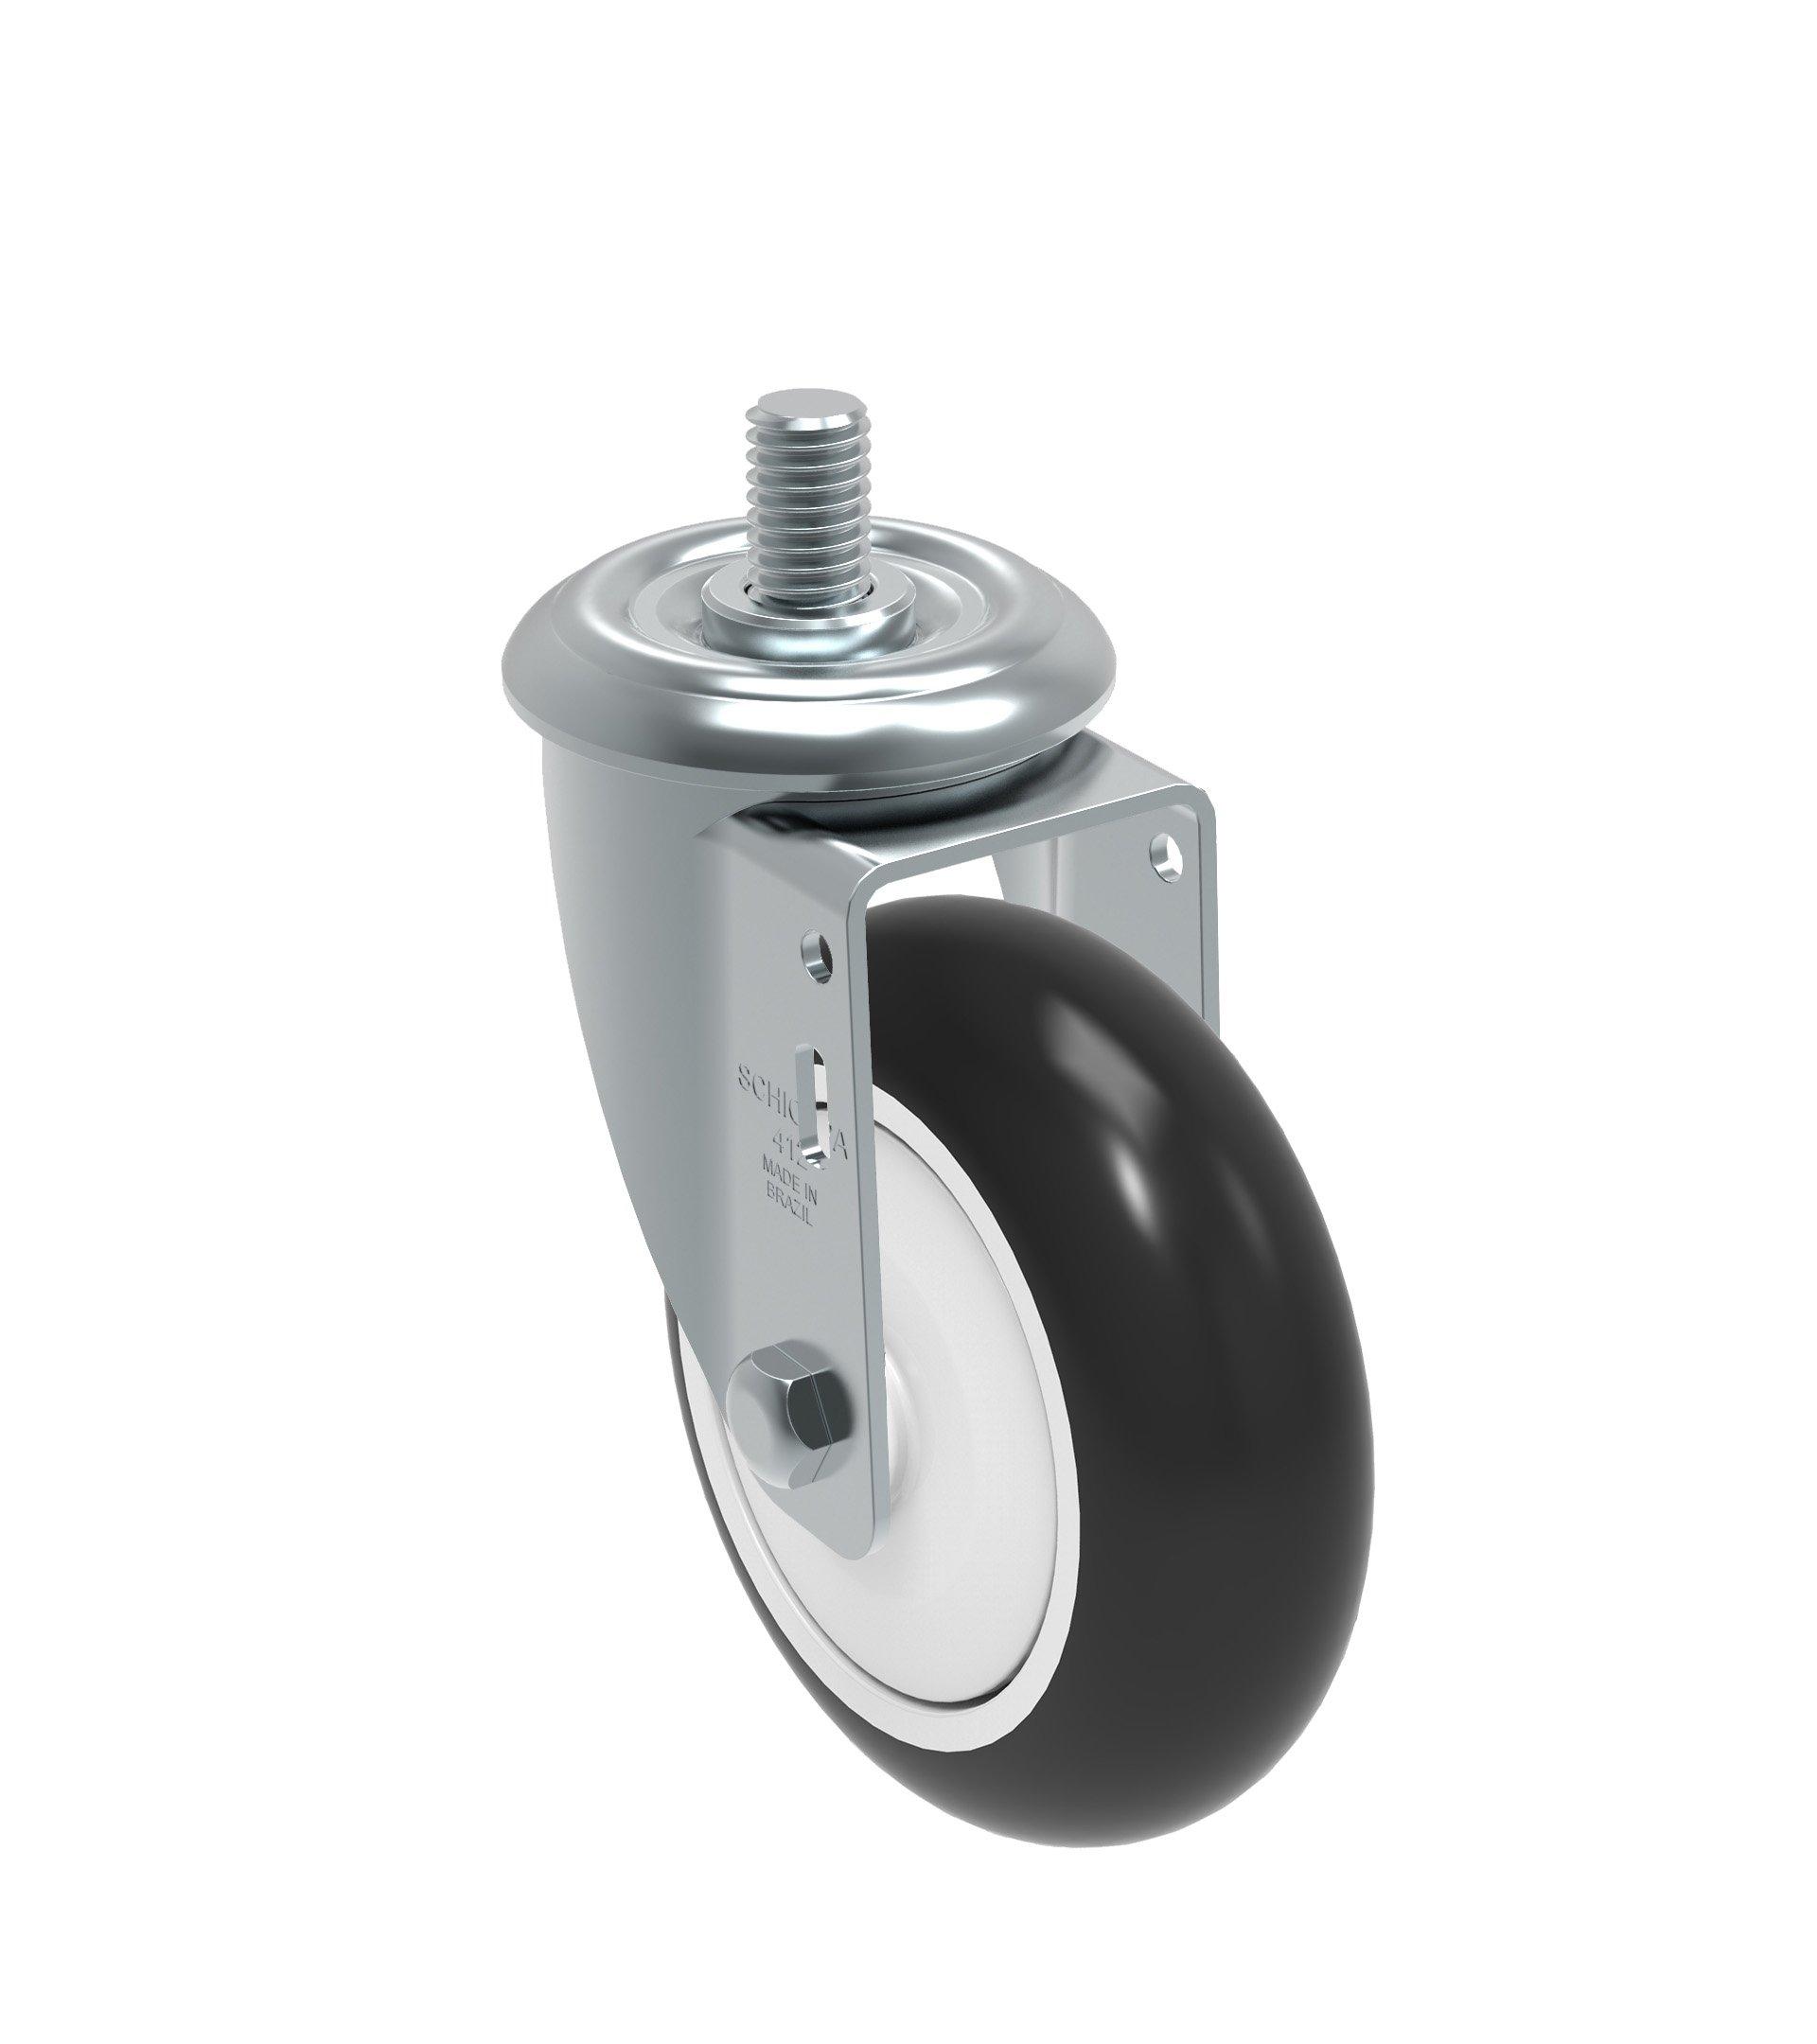 Schioppa GLEHD 412 NPE L12 Series 4'' x 1-1/4'' Diameter Swivel Caster, Non-Marking Polypropylene Precision Ball Bearing Wheel, 12 mm Diameter x 25 mm Length Threaded Stem, 275 lb